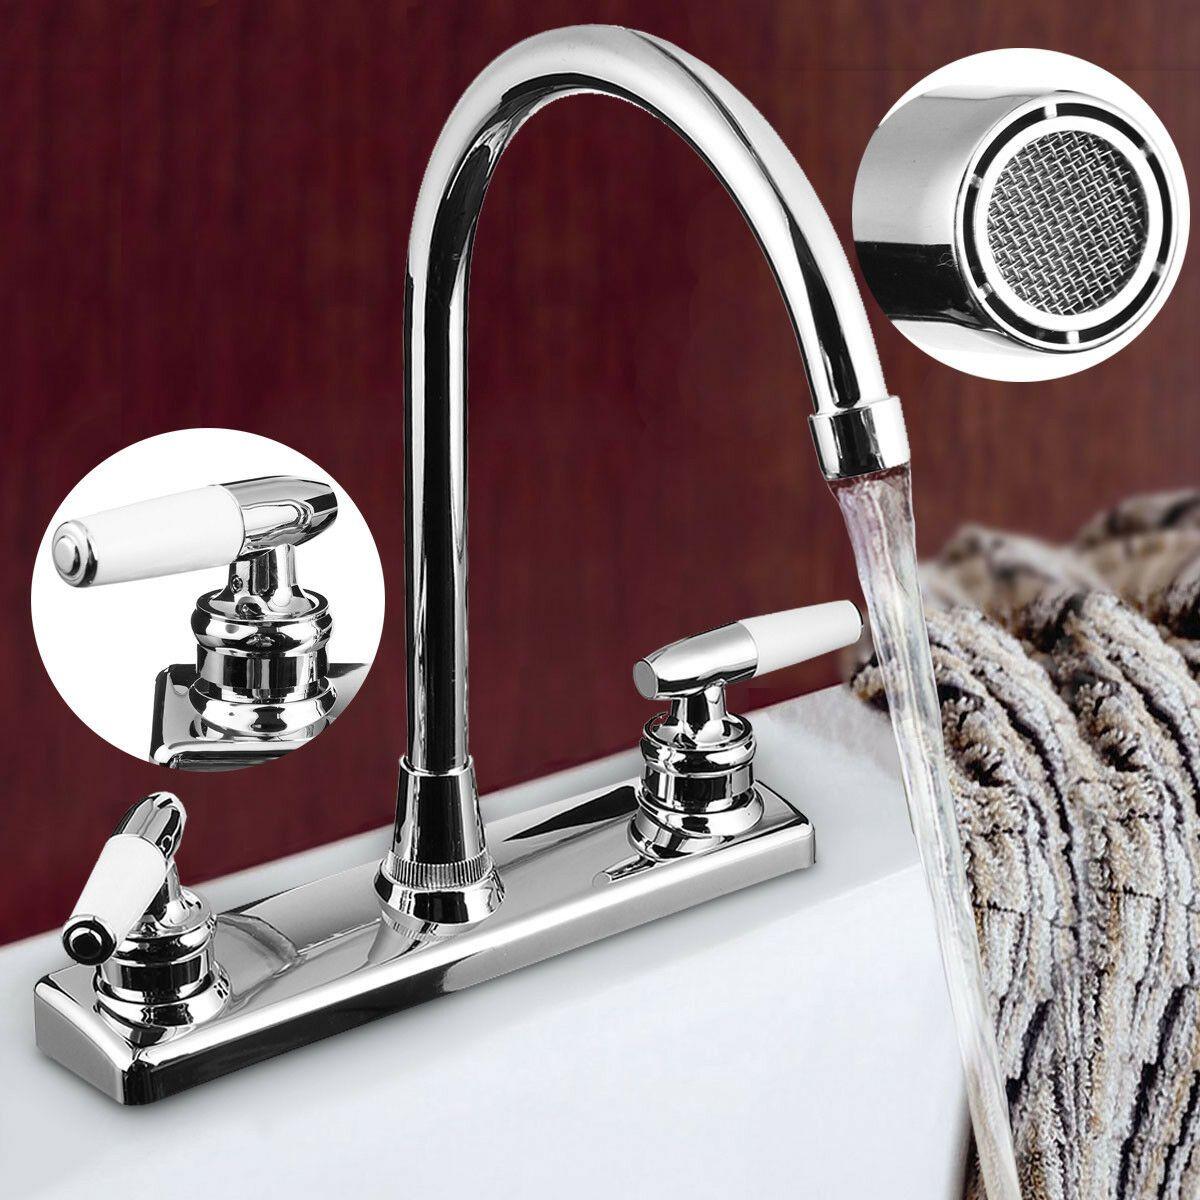 Rv Mobile Home Faucet Dual Handles Hot Cold Basin Sink Kitchen Mixer Tap Us Kitchen Faucets Ideas Of Kitchen Fauce Sink Sink Mixer Taps Kitchen Faucet